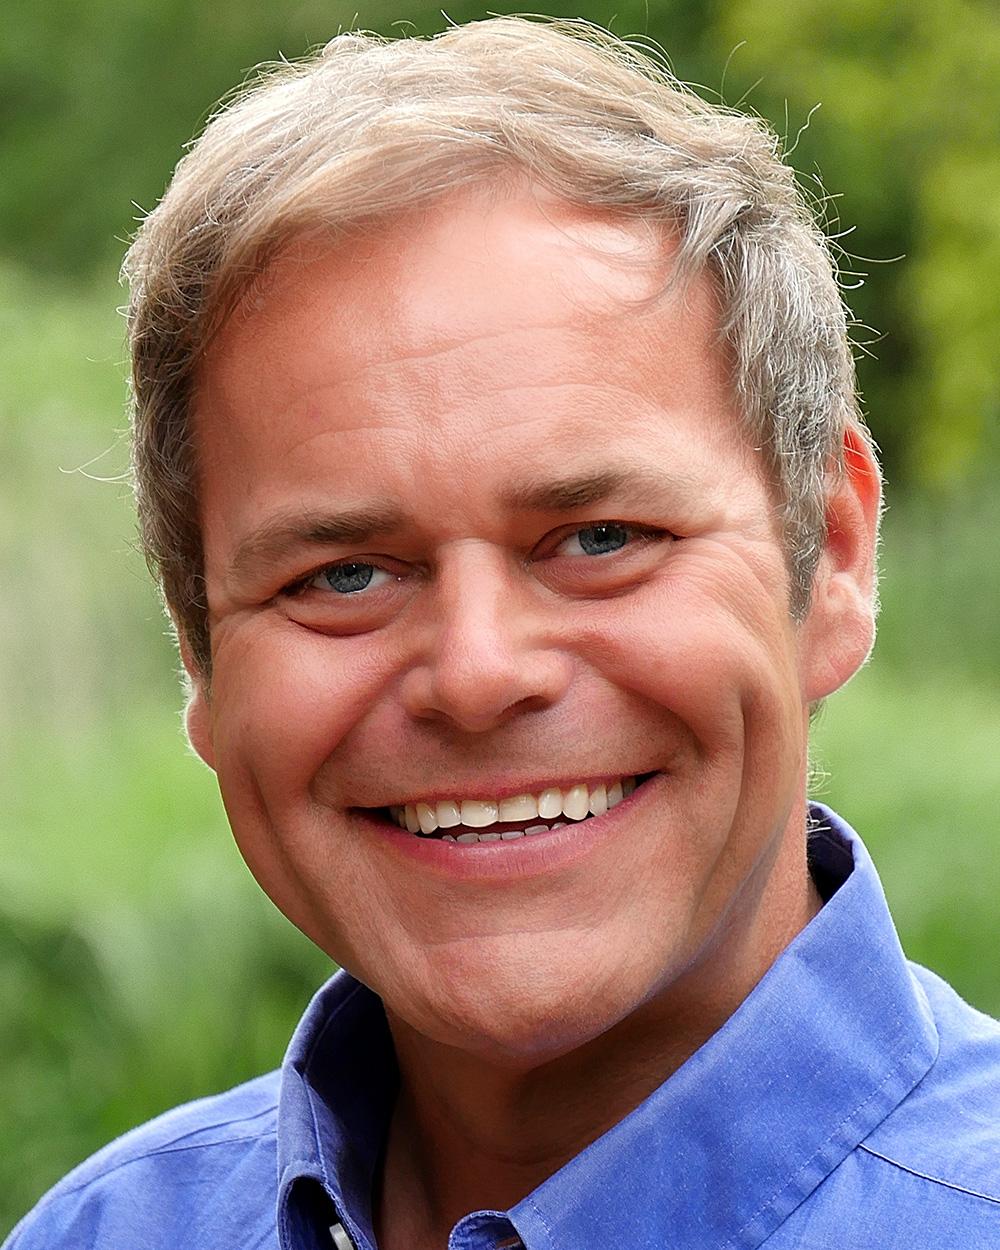 Glenn Kinsey